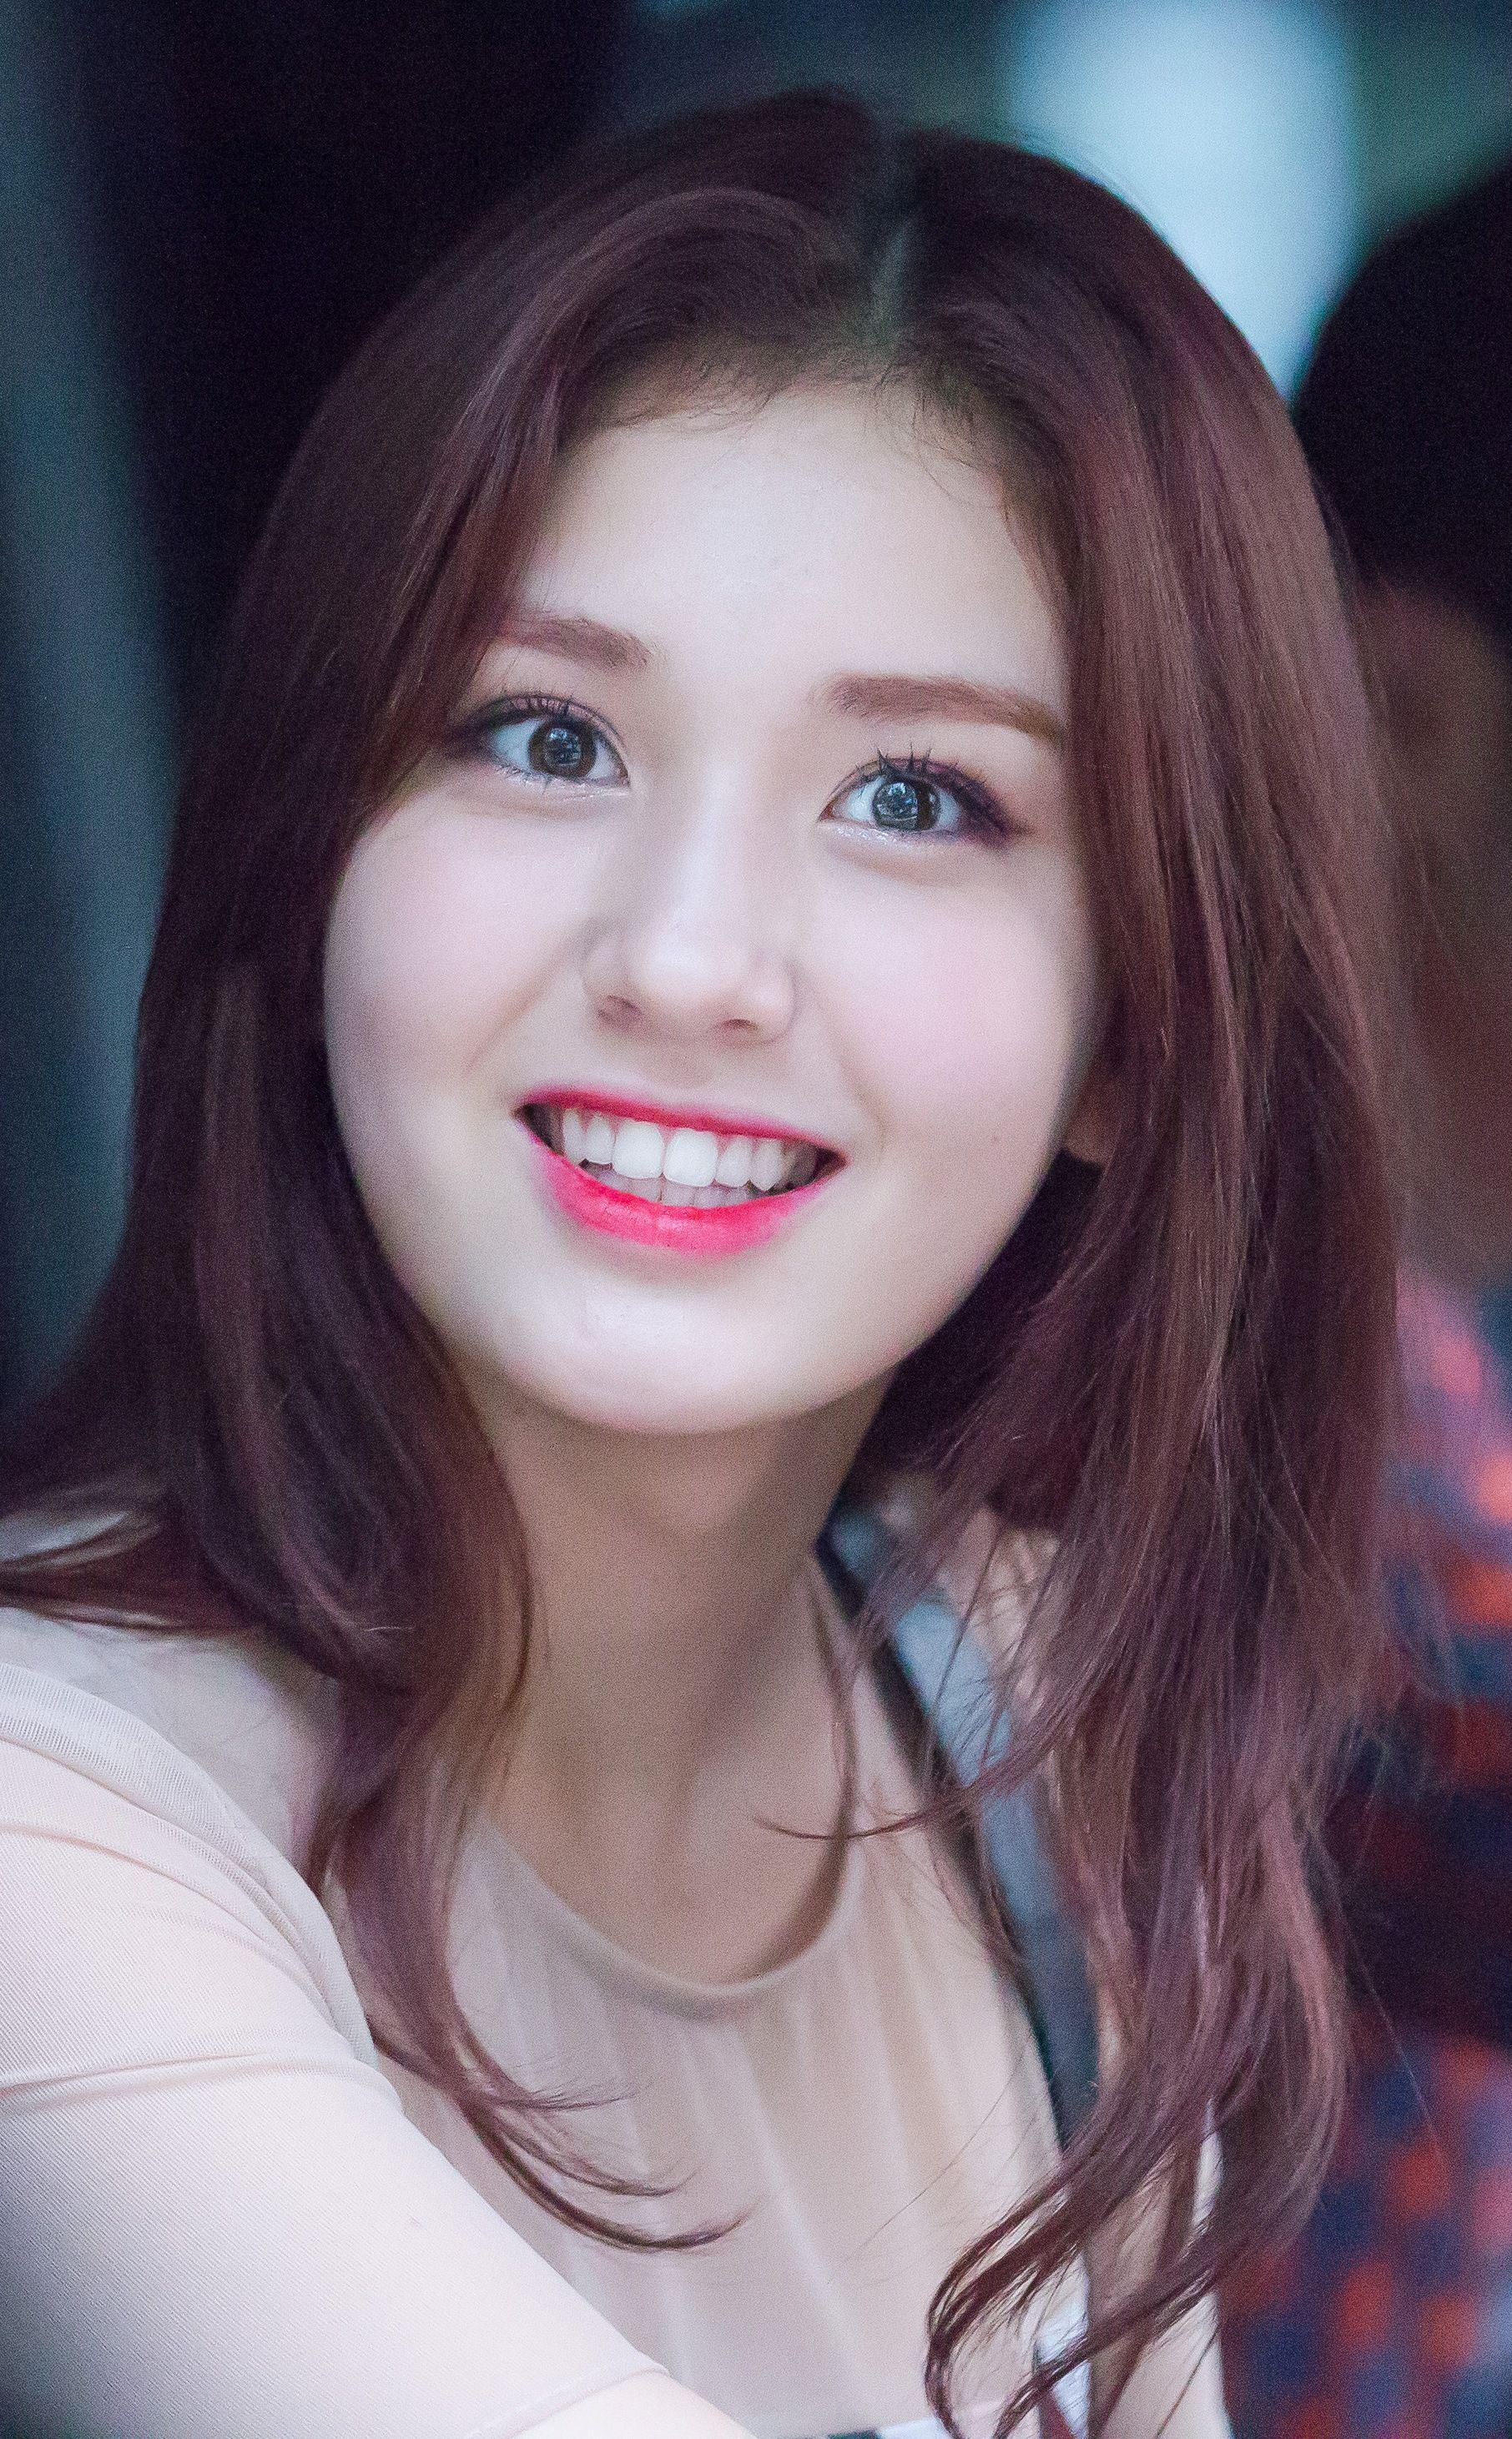 I.O.I (아이오아이) / GUGUDAN (구구단) - Kim Sejeong (김세정